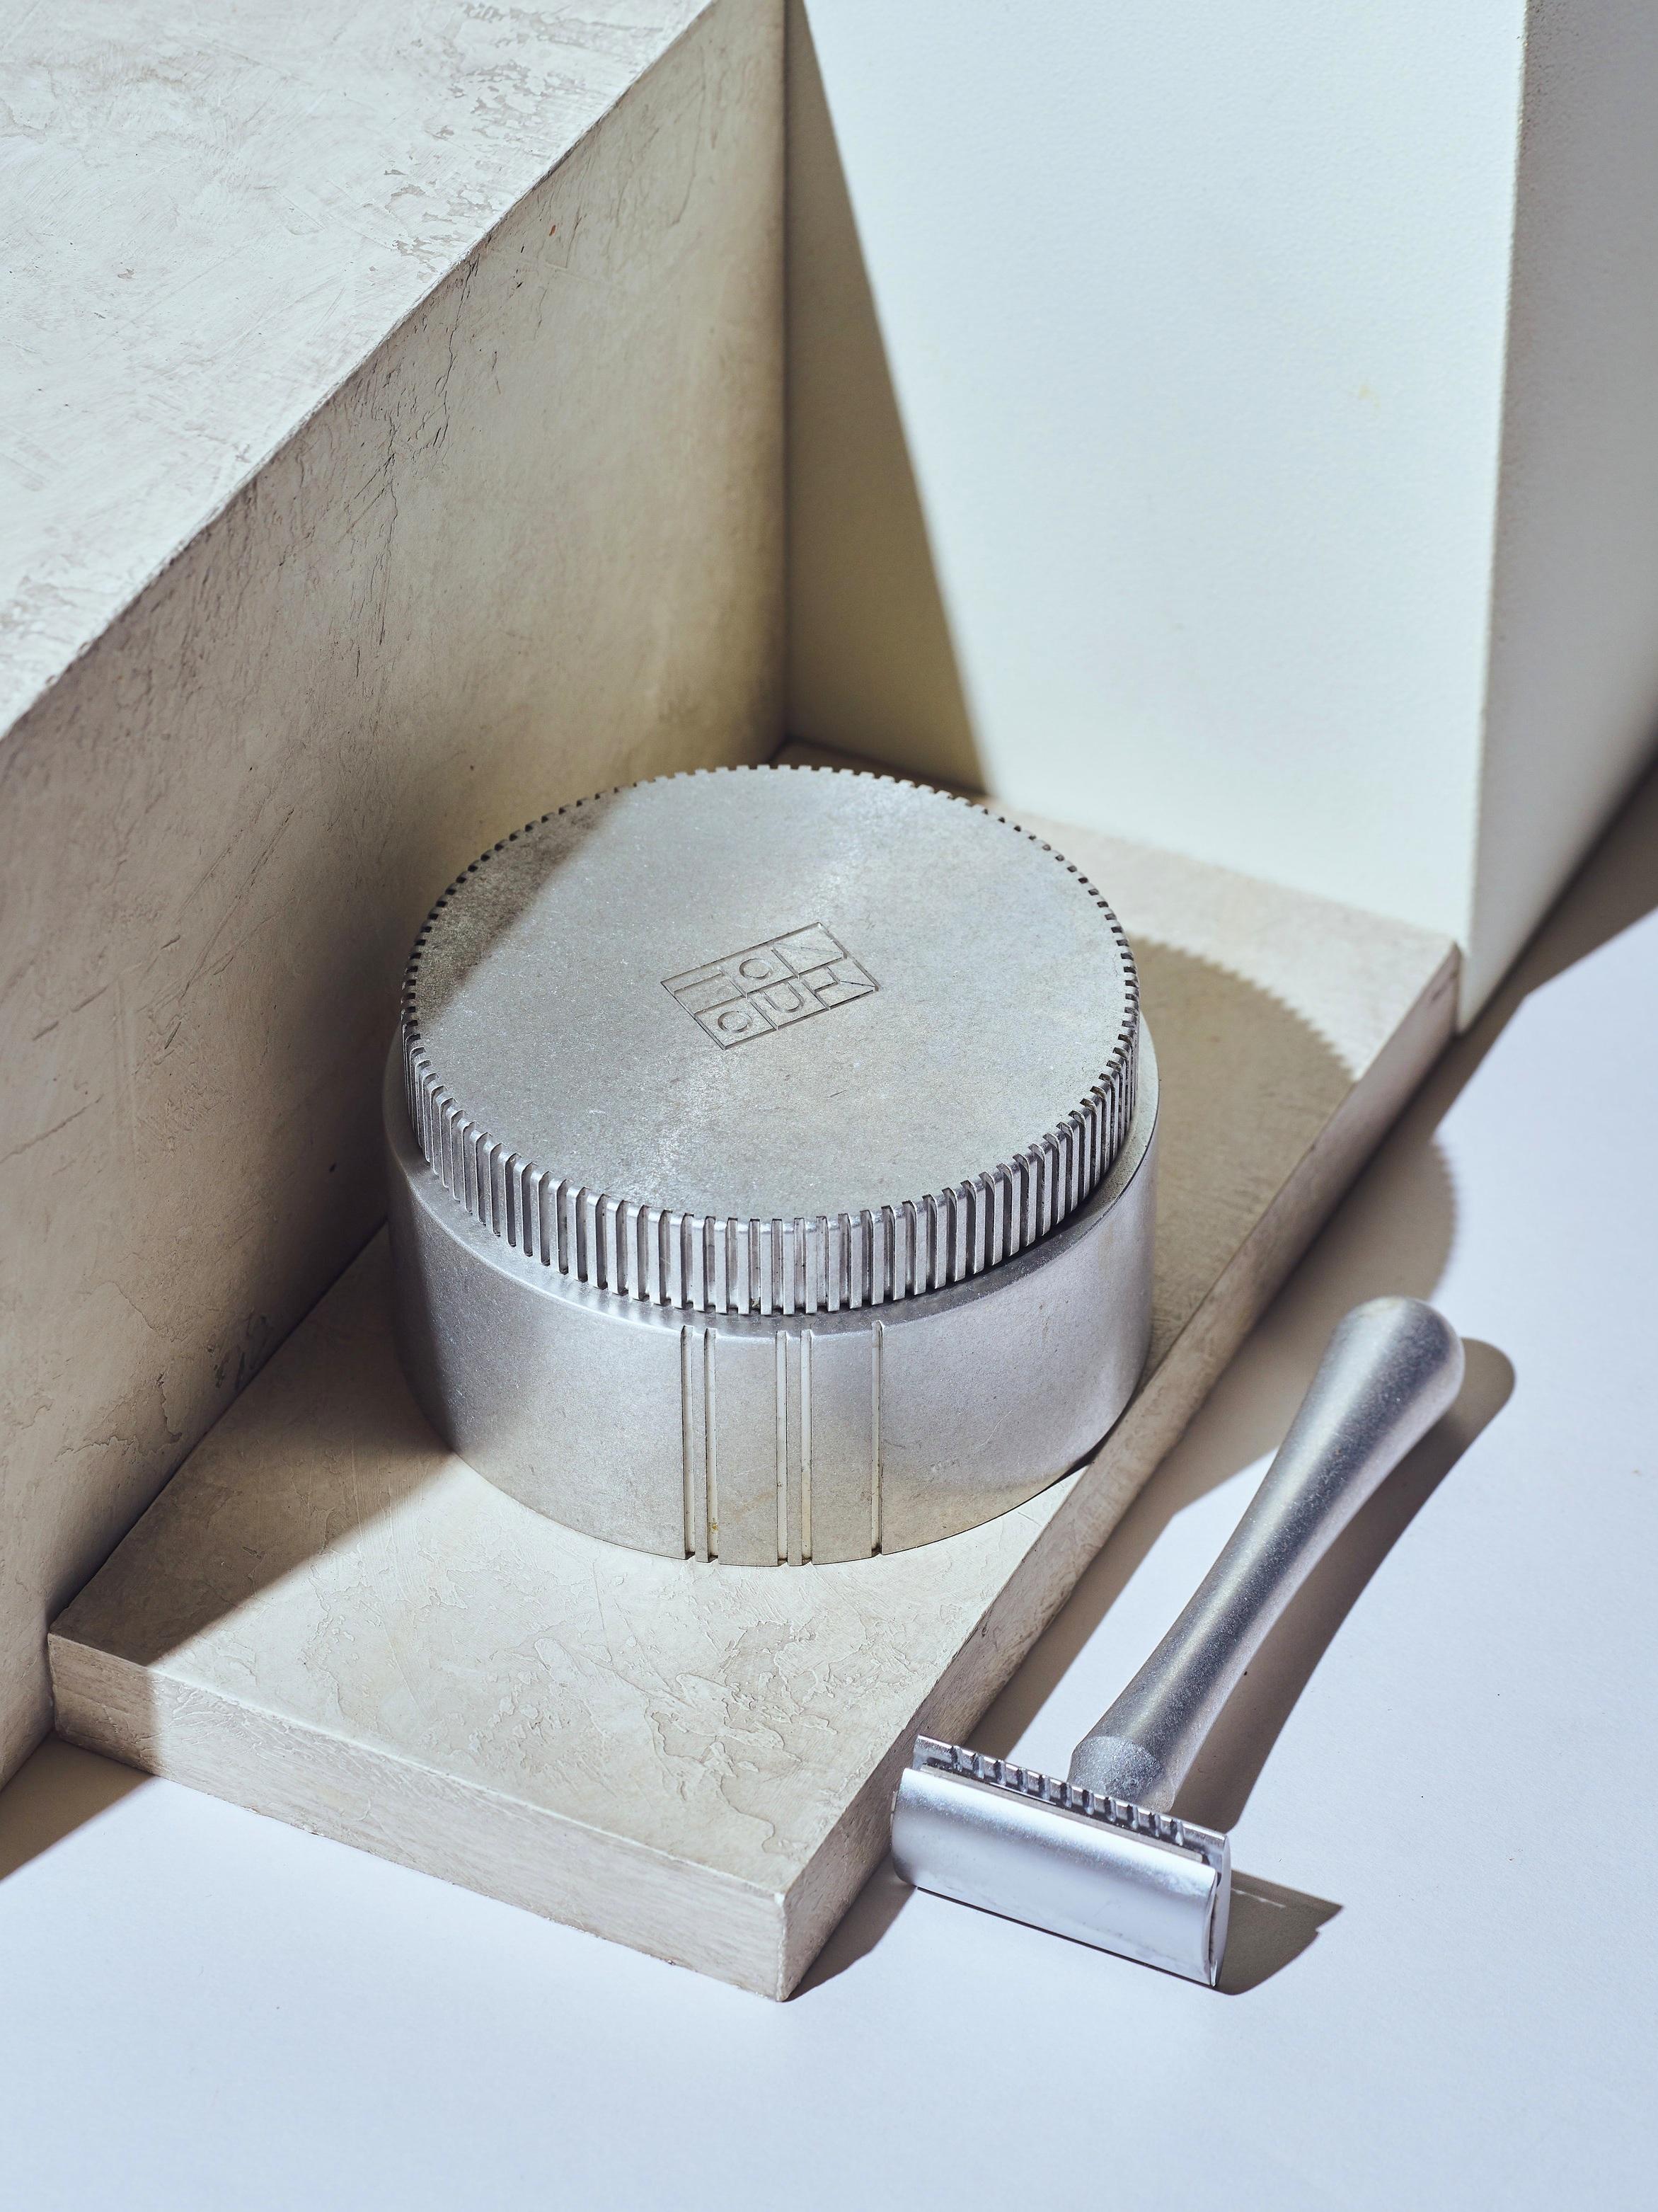 Honours Essentials Double Edge Safety Razor + Shave Cream -